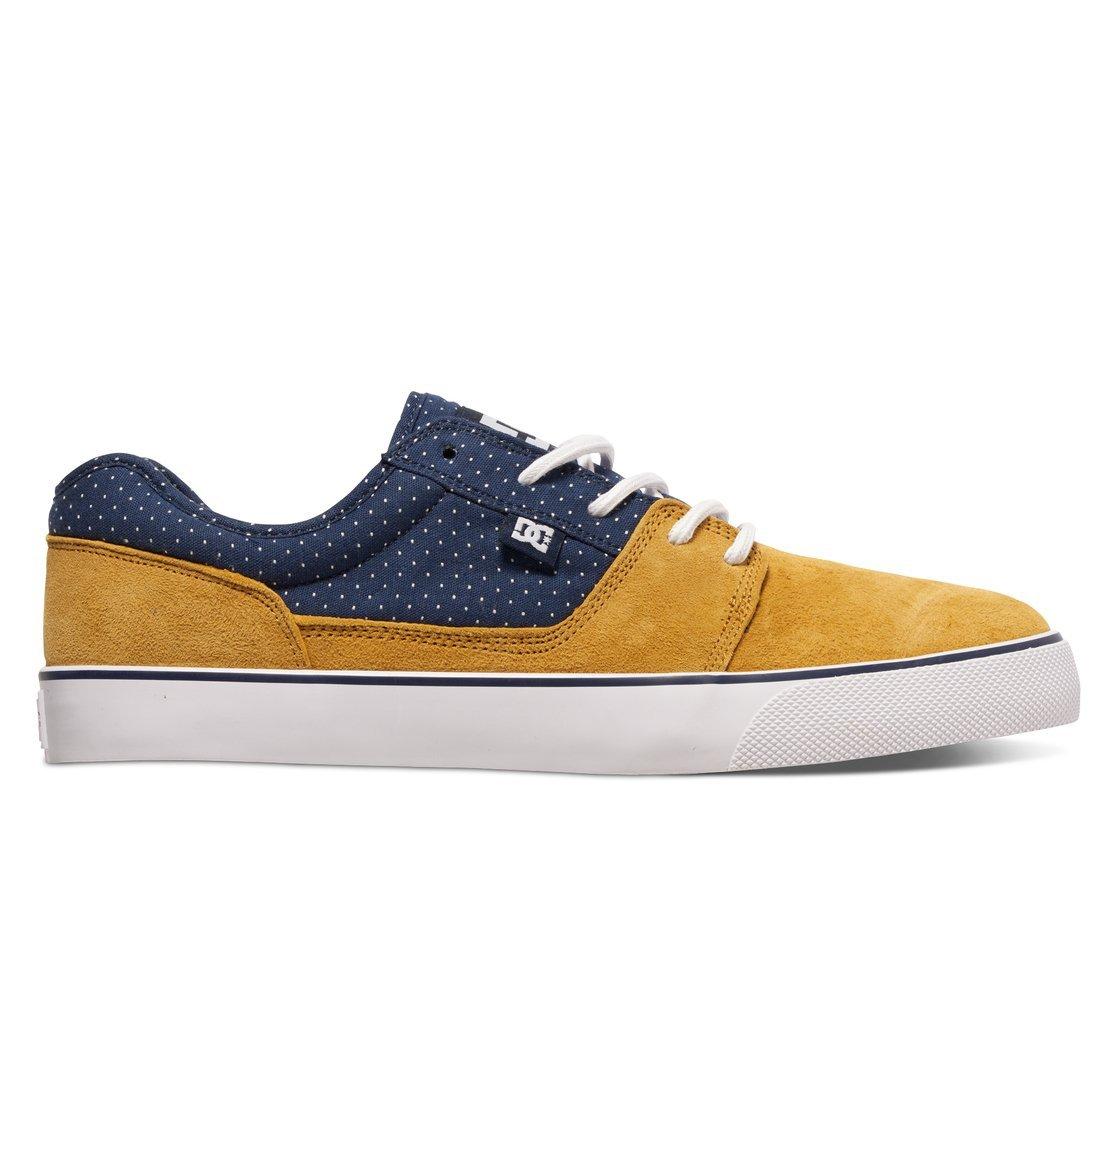 DC Men's Tonik SE Skate Shoe 6 D(M) US|Camel